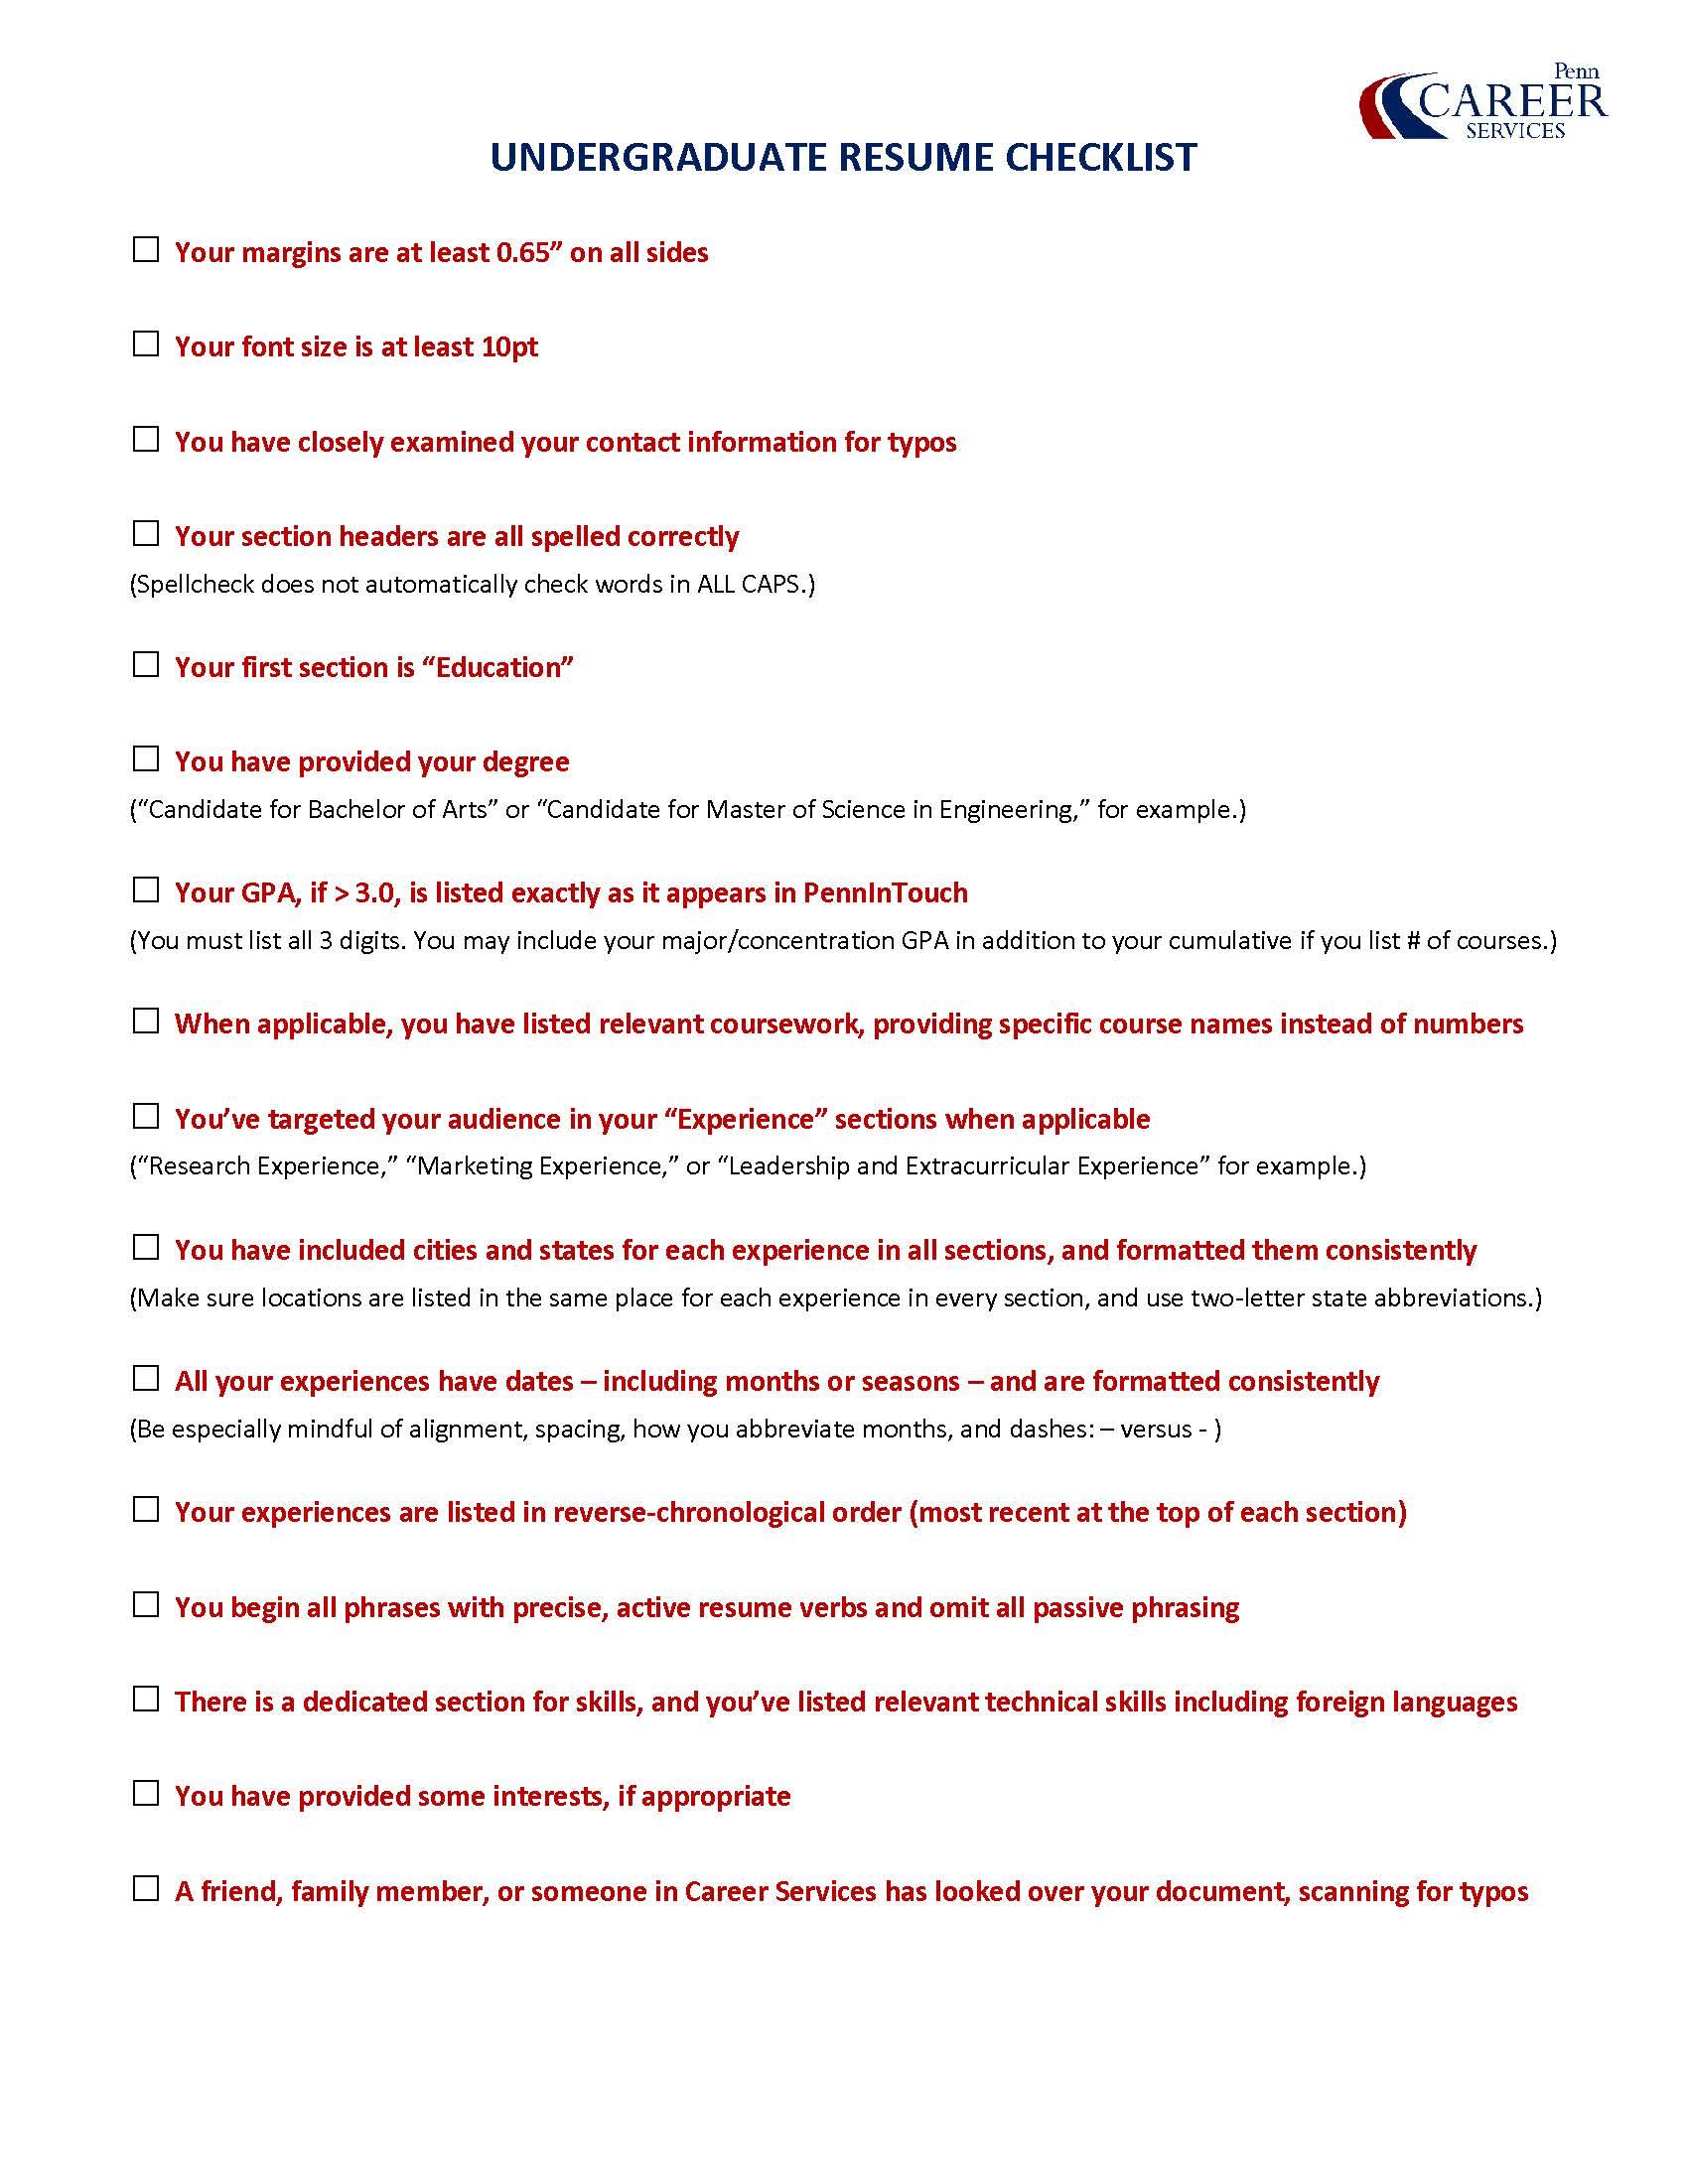 career services undergrad resume checklist  u2013 career